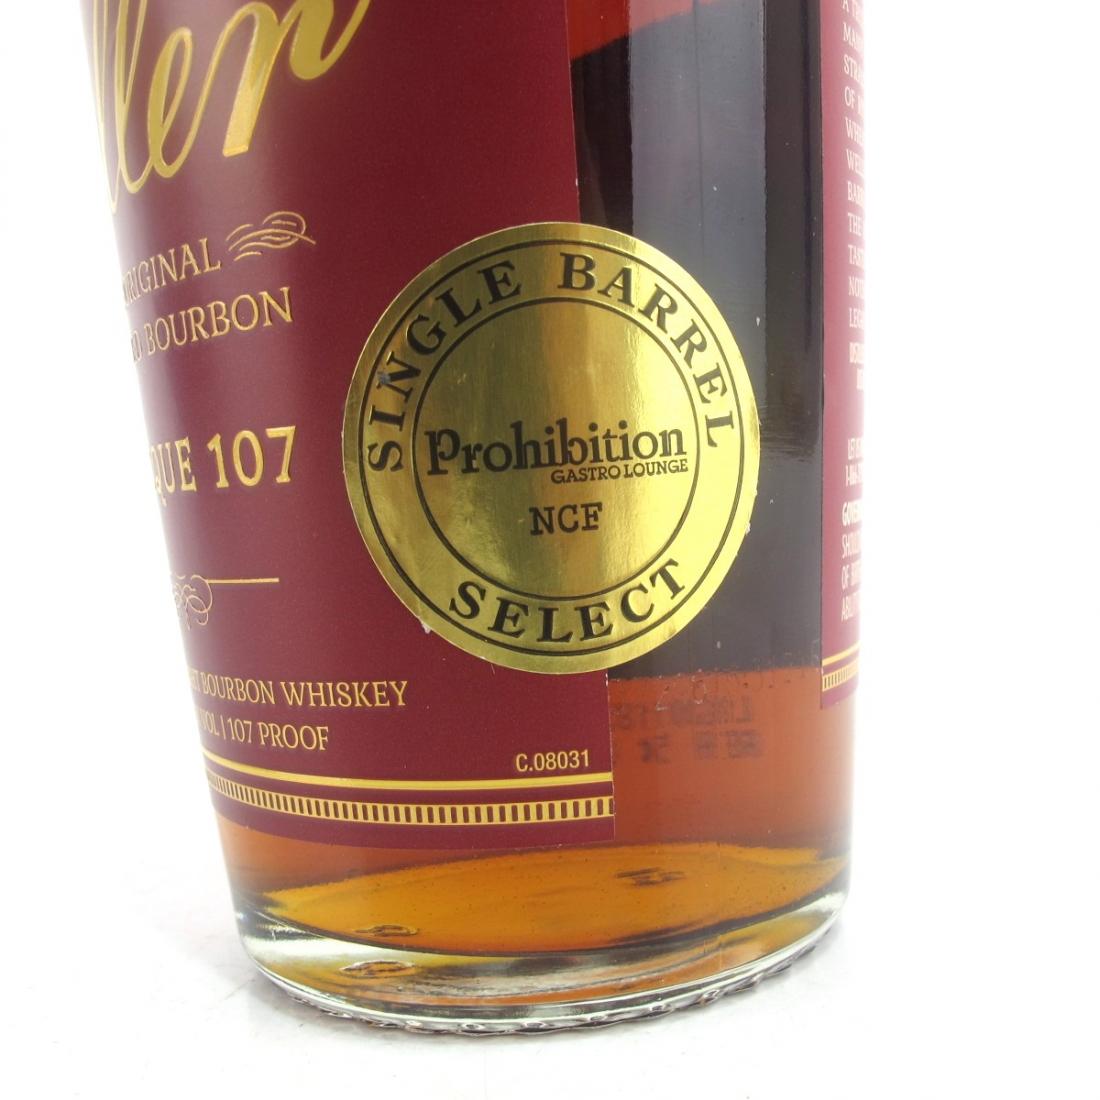 Weller Antique 107 Single Barrel / Prohibition Gastro Lounge